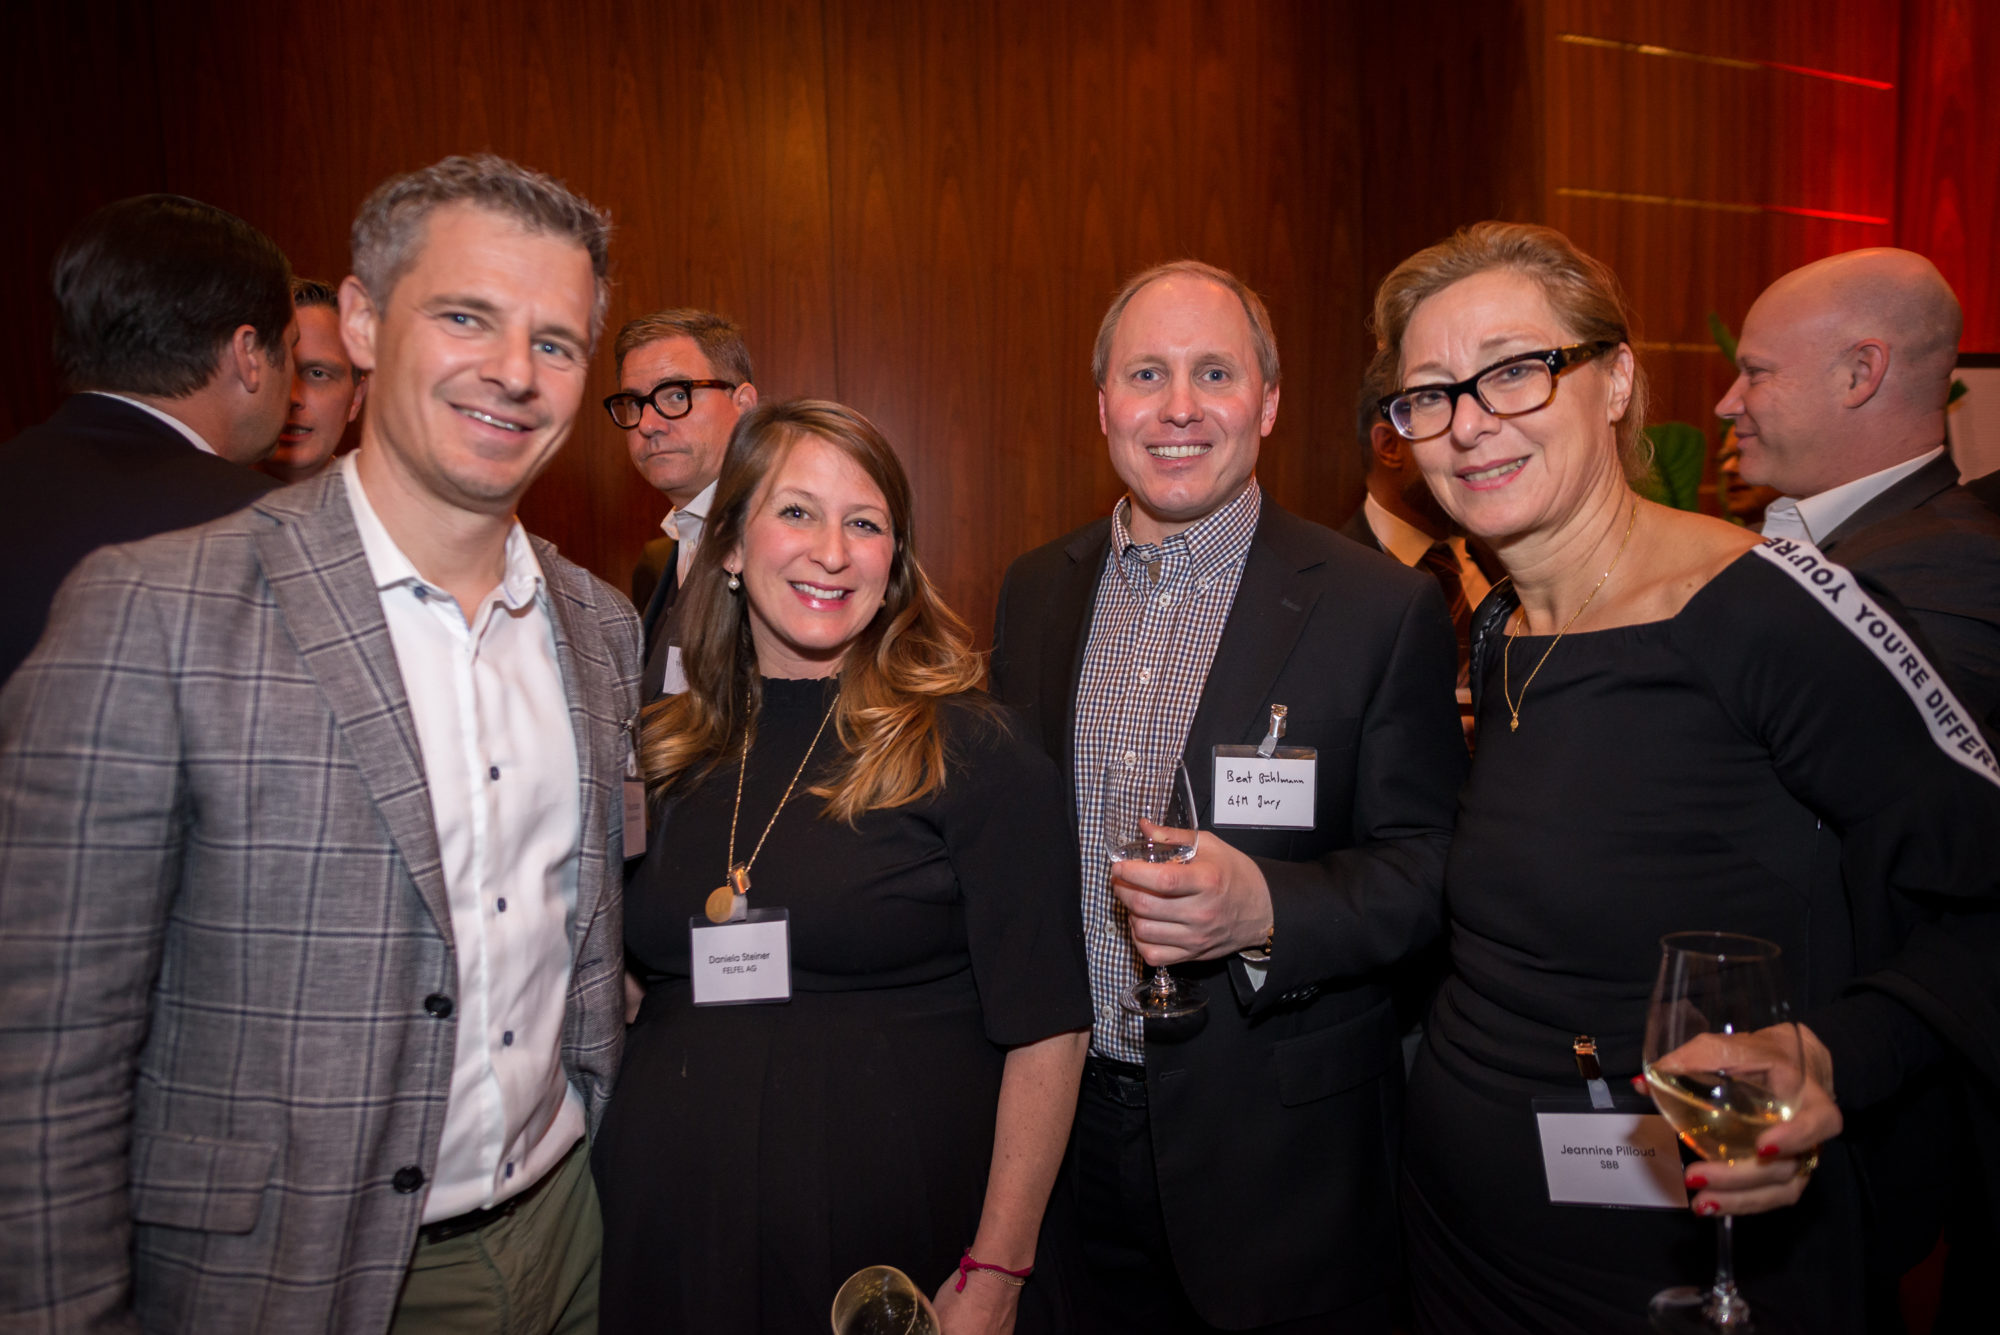 Philipp Sauber (Plan.Net Suisse AG), Daniela Steiner (FELFEL AG), Beat Bühlmann (GfM Jury), Jeannine Pilloud (SBB)